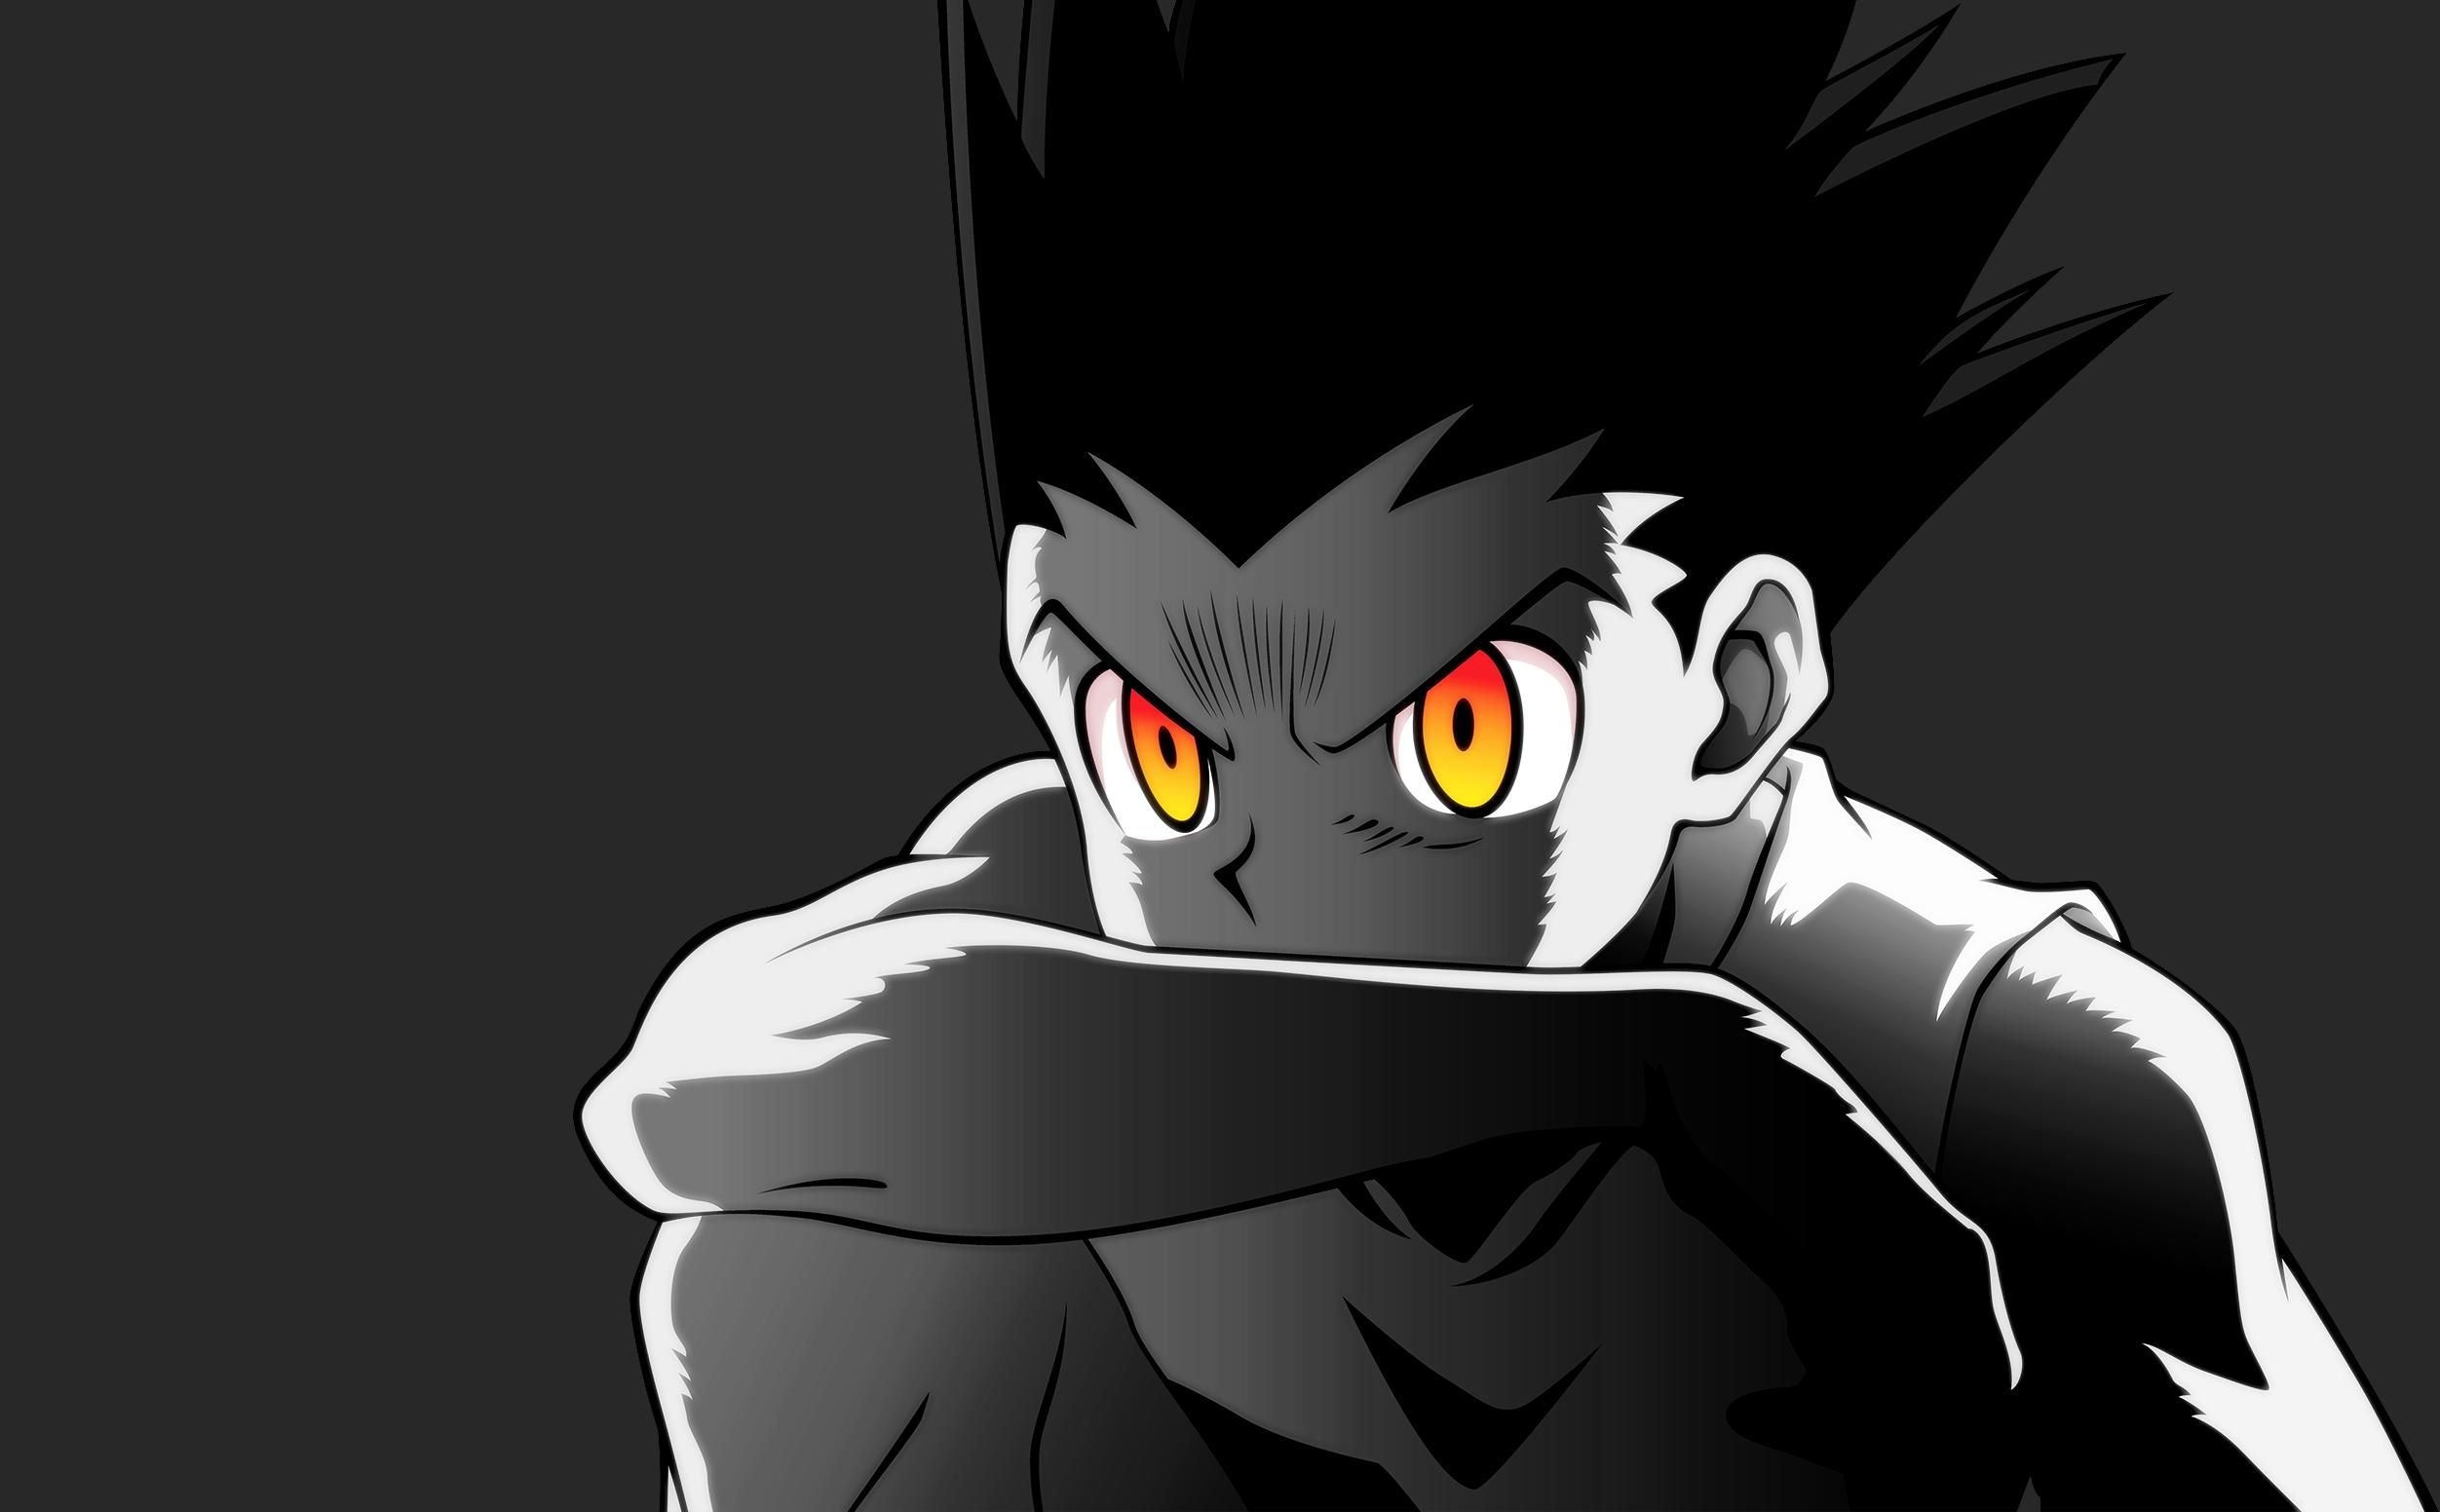 Hunter X Hunter Gon Dowload Anime Wallpaper Hd